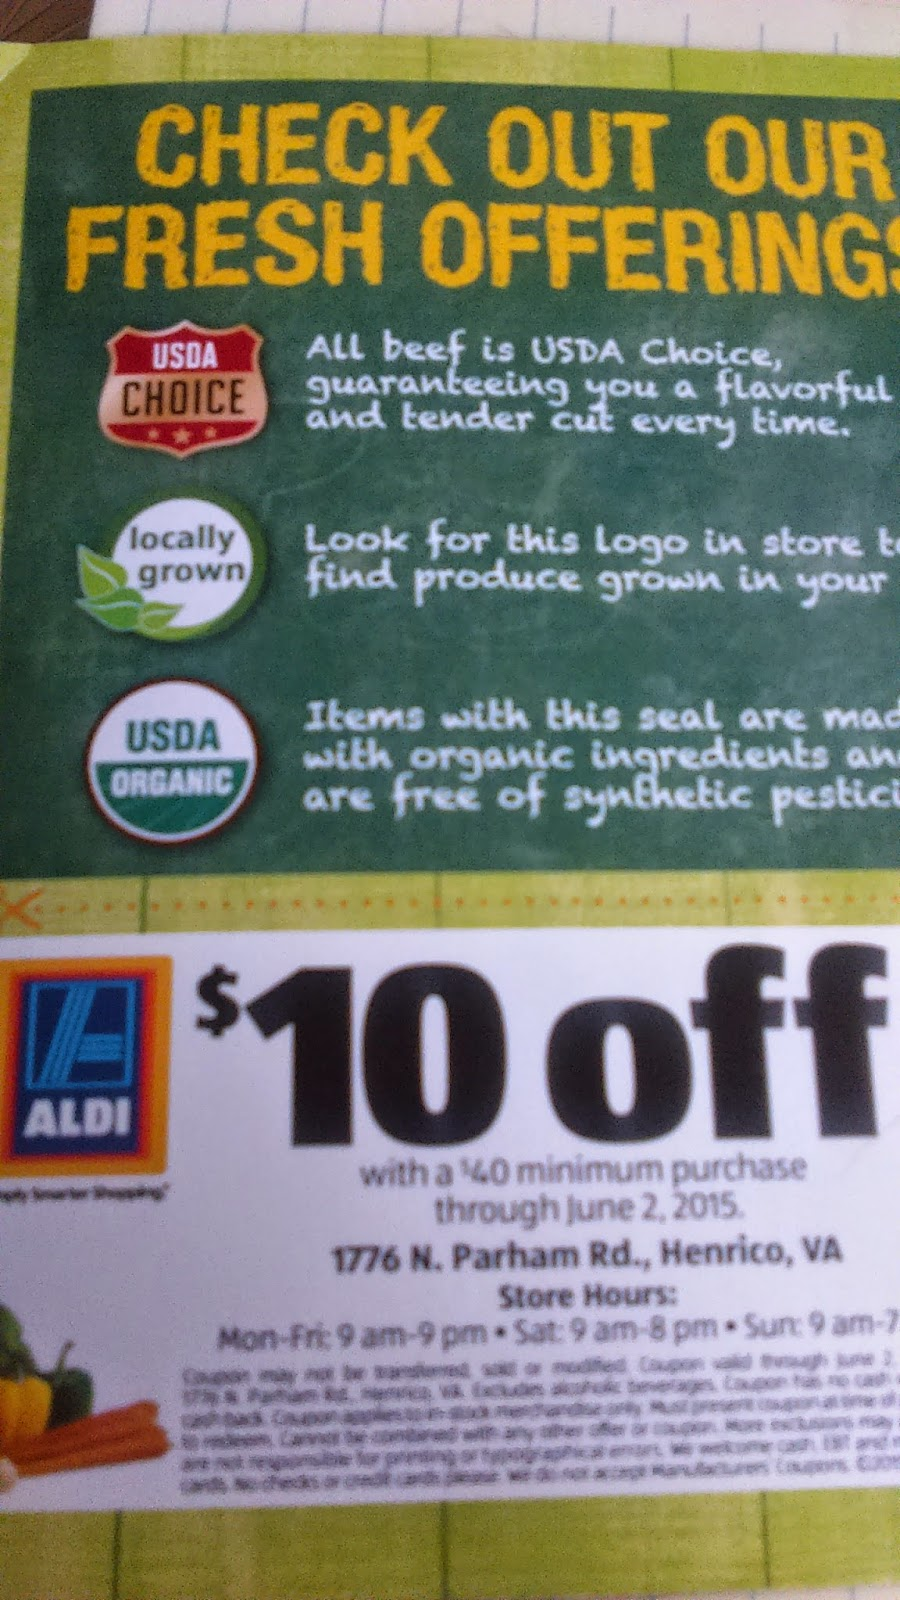 Aldi coupons discounts